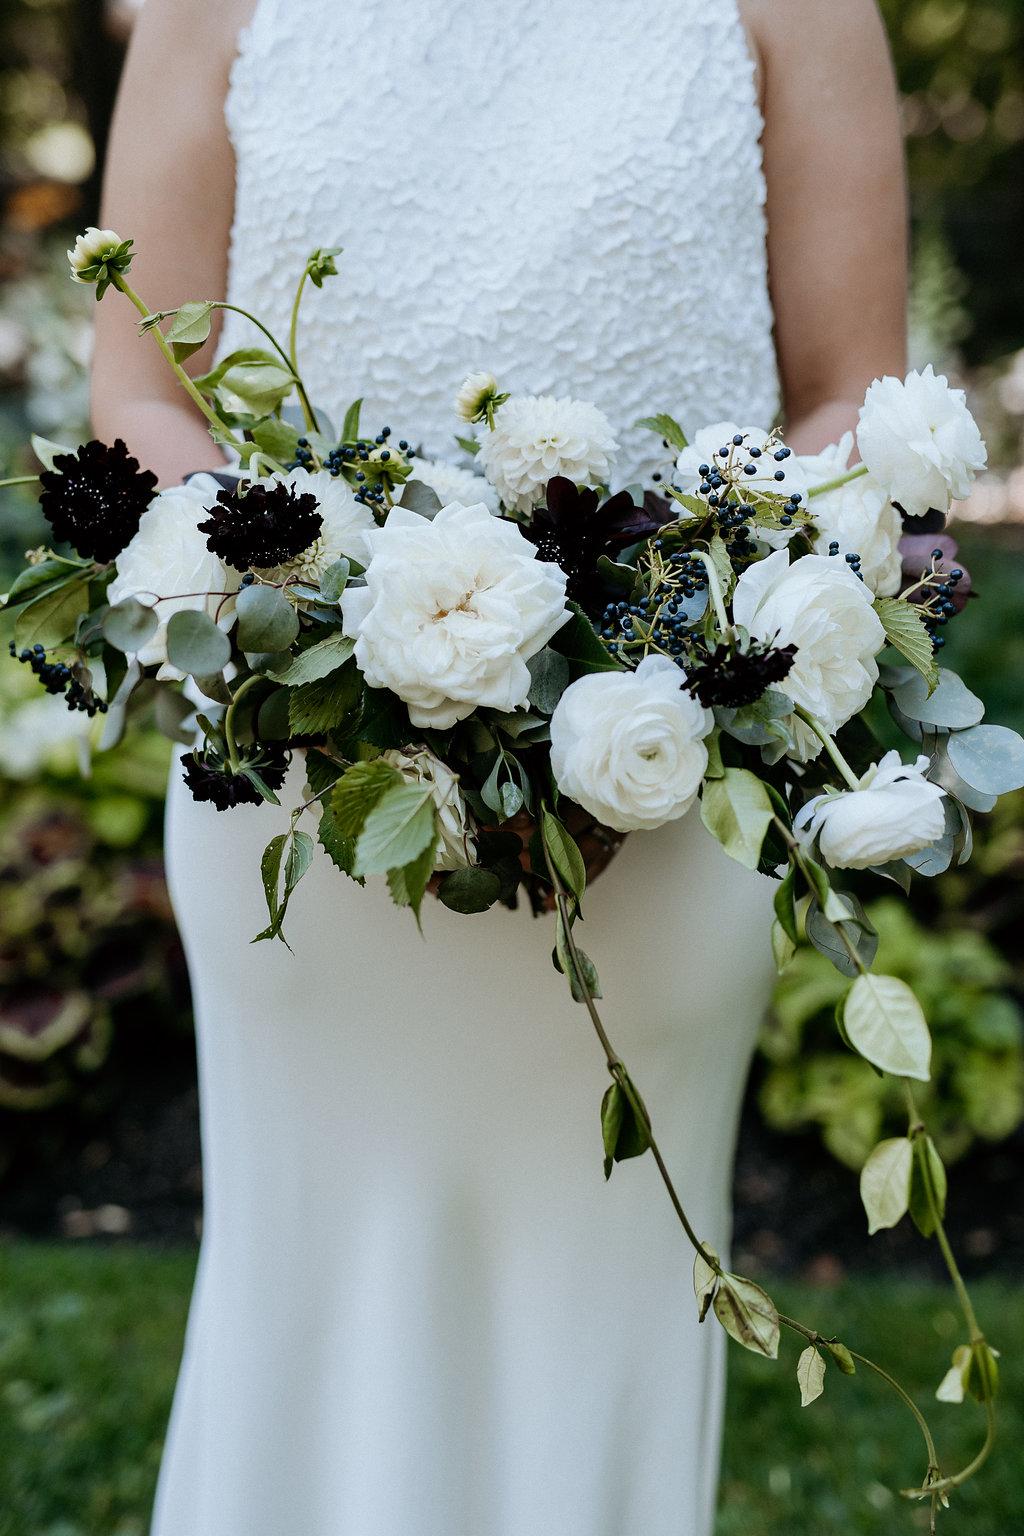 Modern Black and White Bridal Bouquet - Best Wedding Florists in Winnipeg